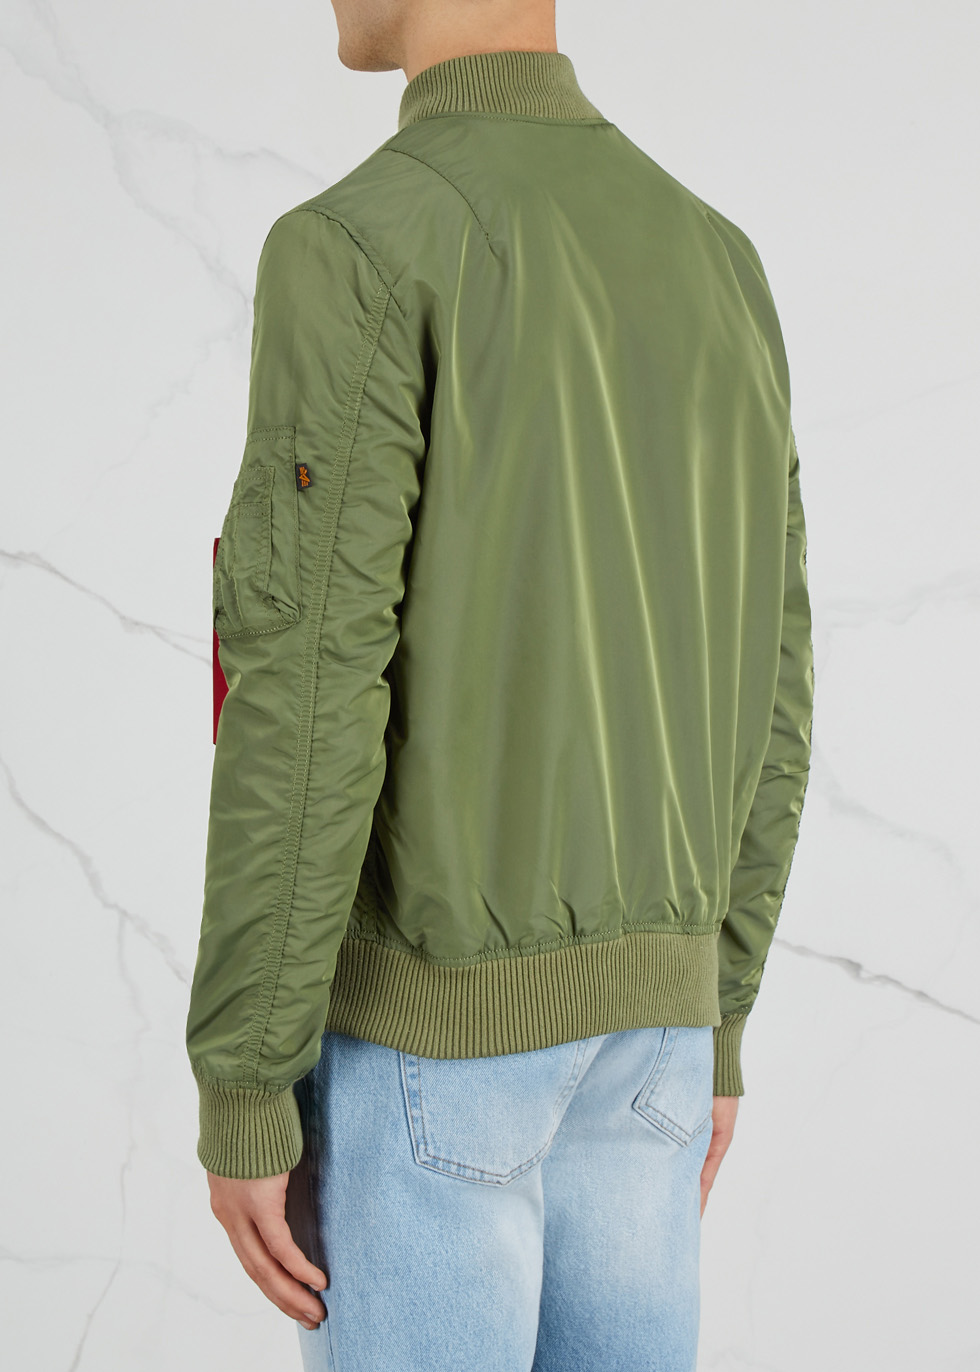 MA1-TT olive shell bomber jacket - Alpha Industries